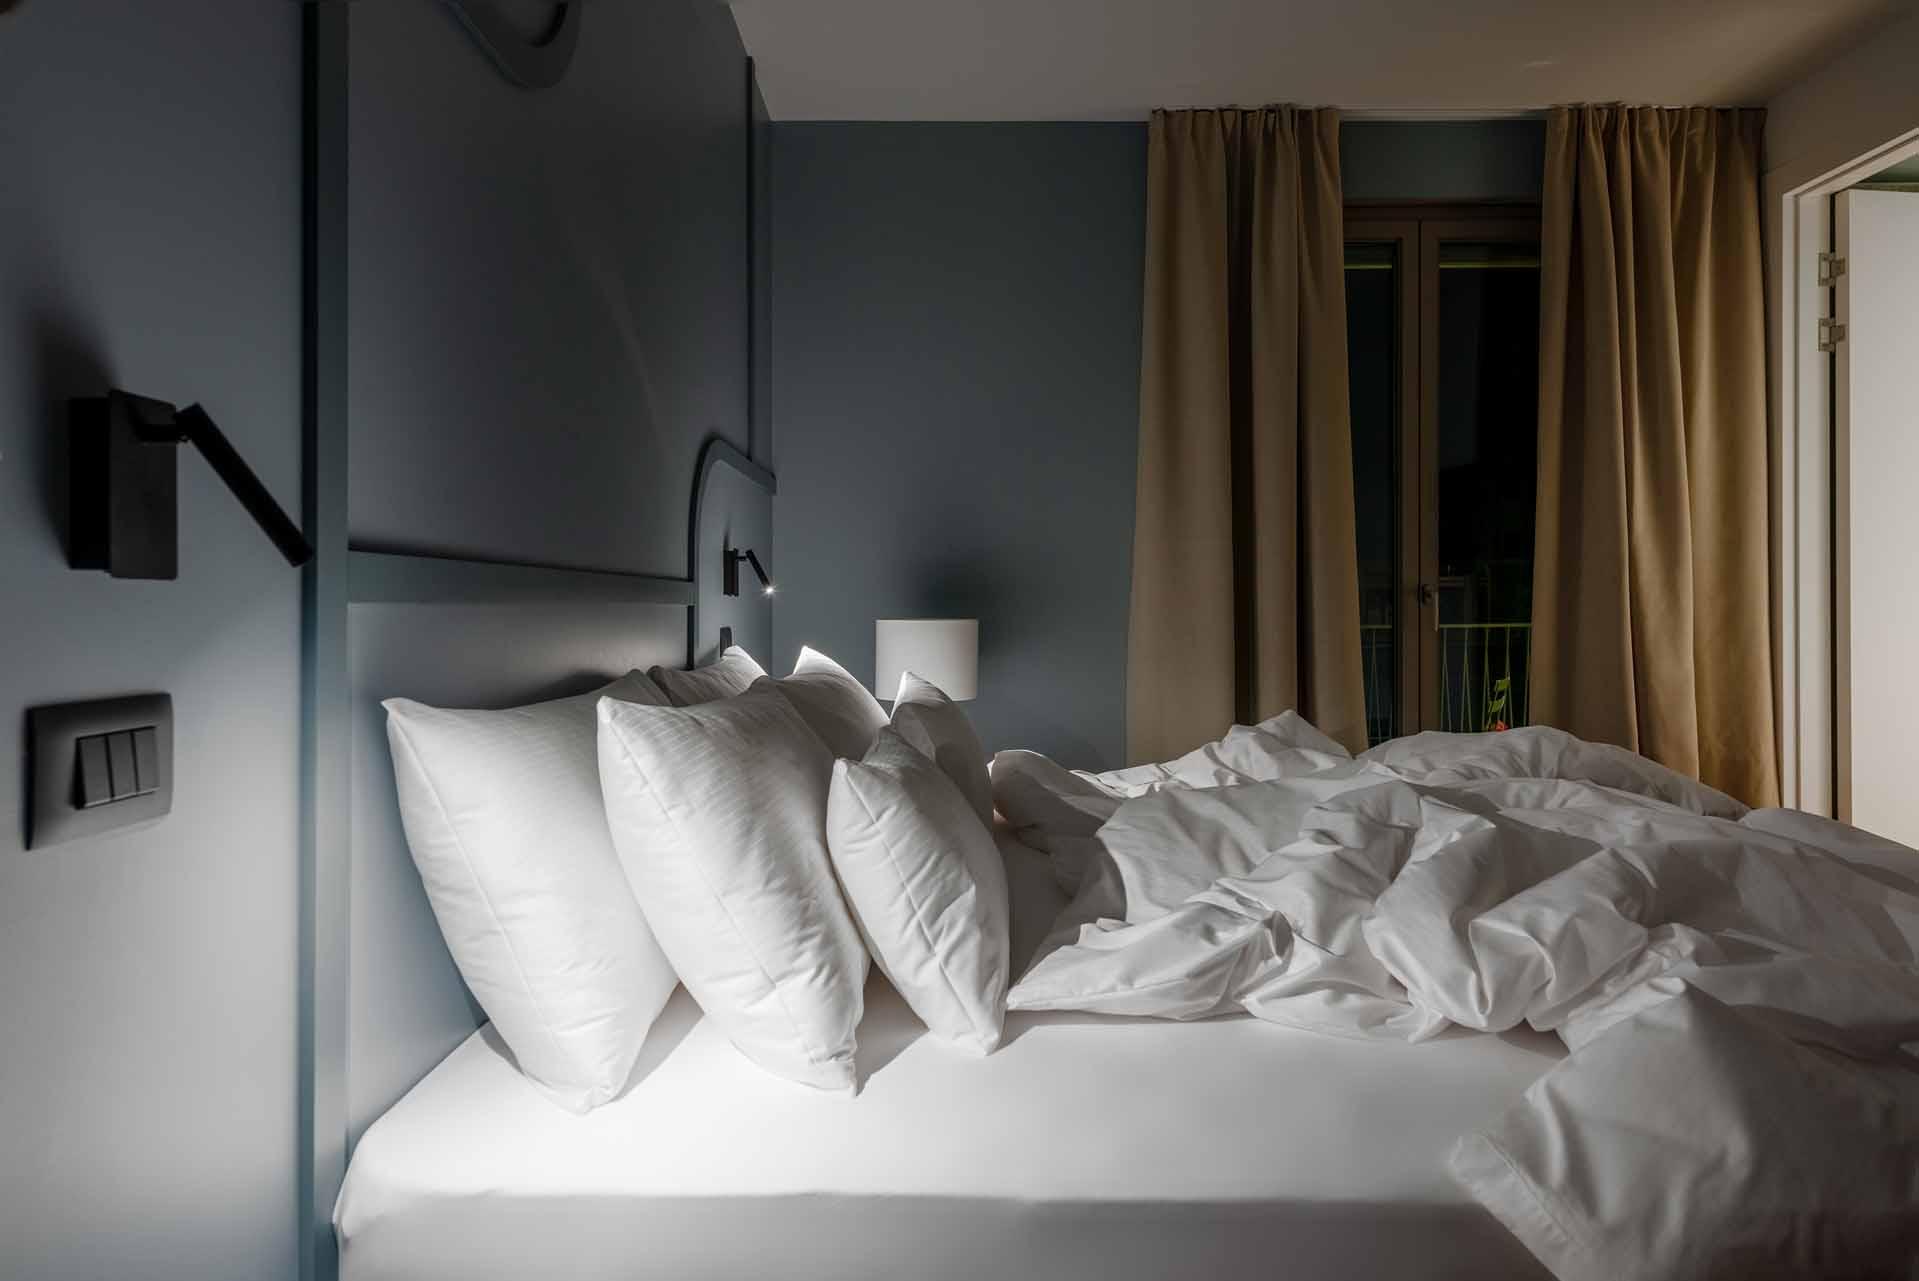 Hotel Trieste Gradisca 027